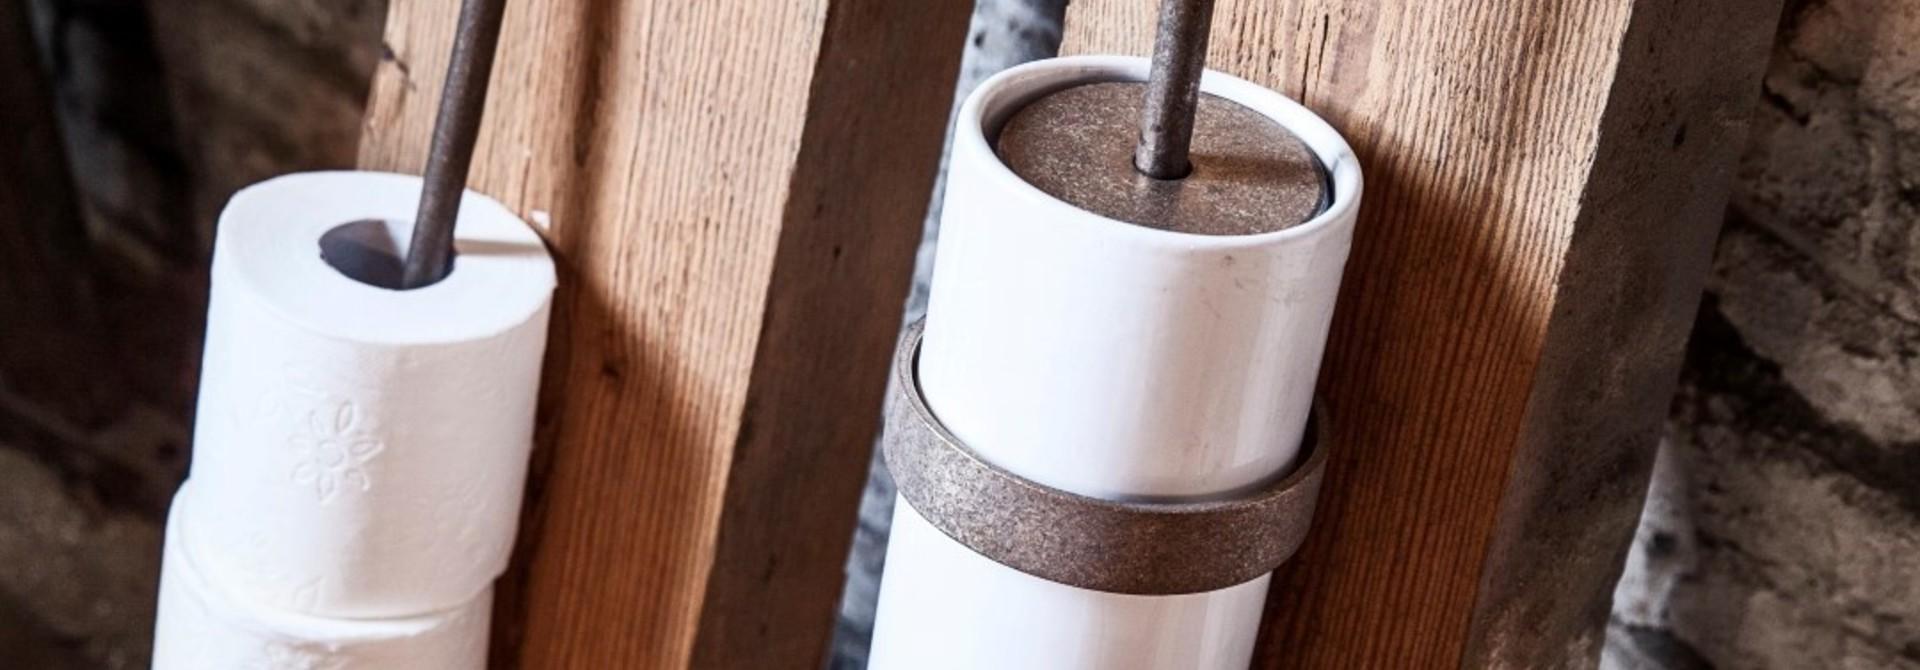 Toiletrolhouder ruw brons 15 cm links